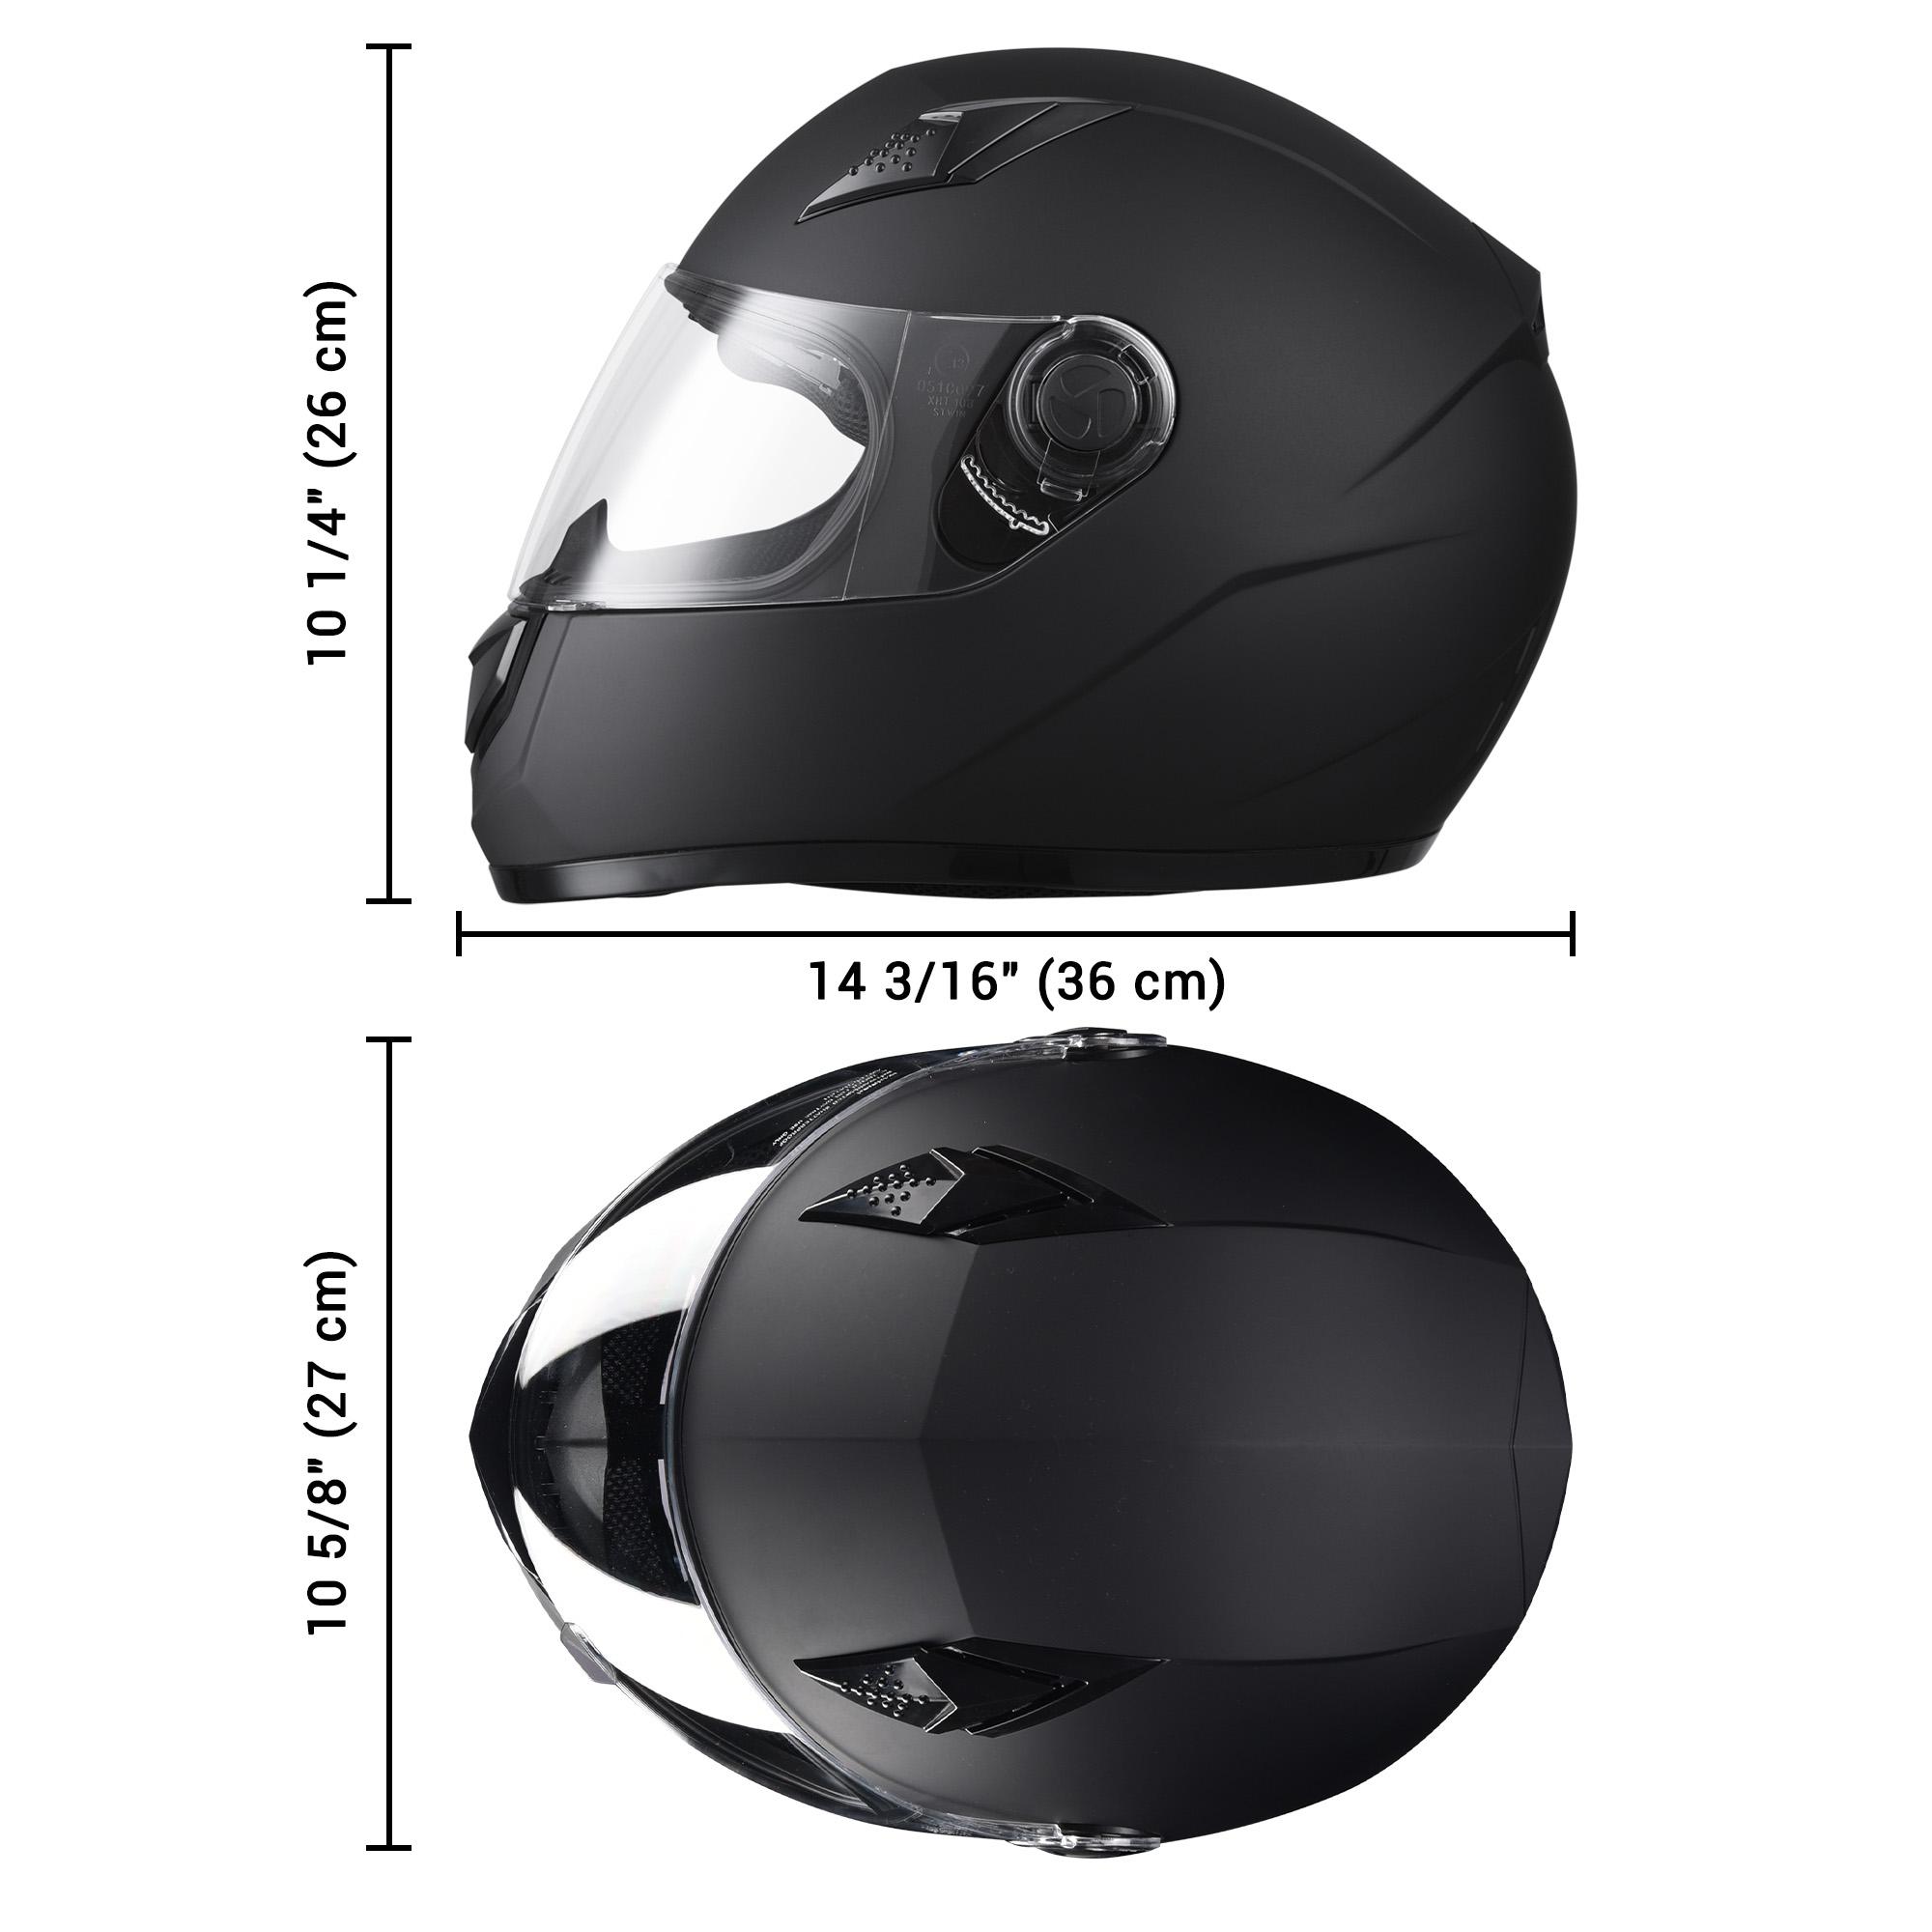 miniature 34 - AHR K12 Full Face Motorcycle Helmet DOT Air Vents Clear Visor Racing S M L XL